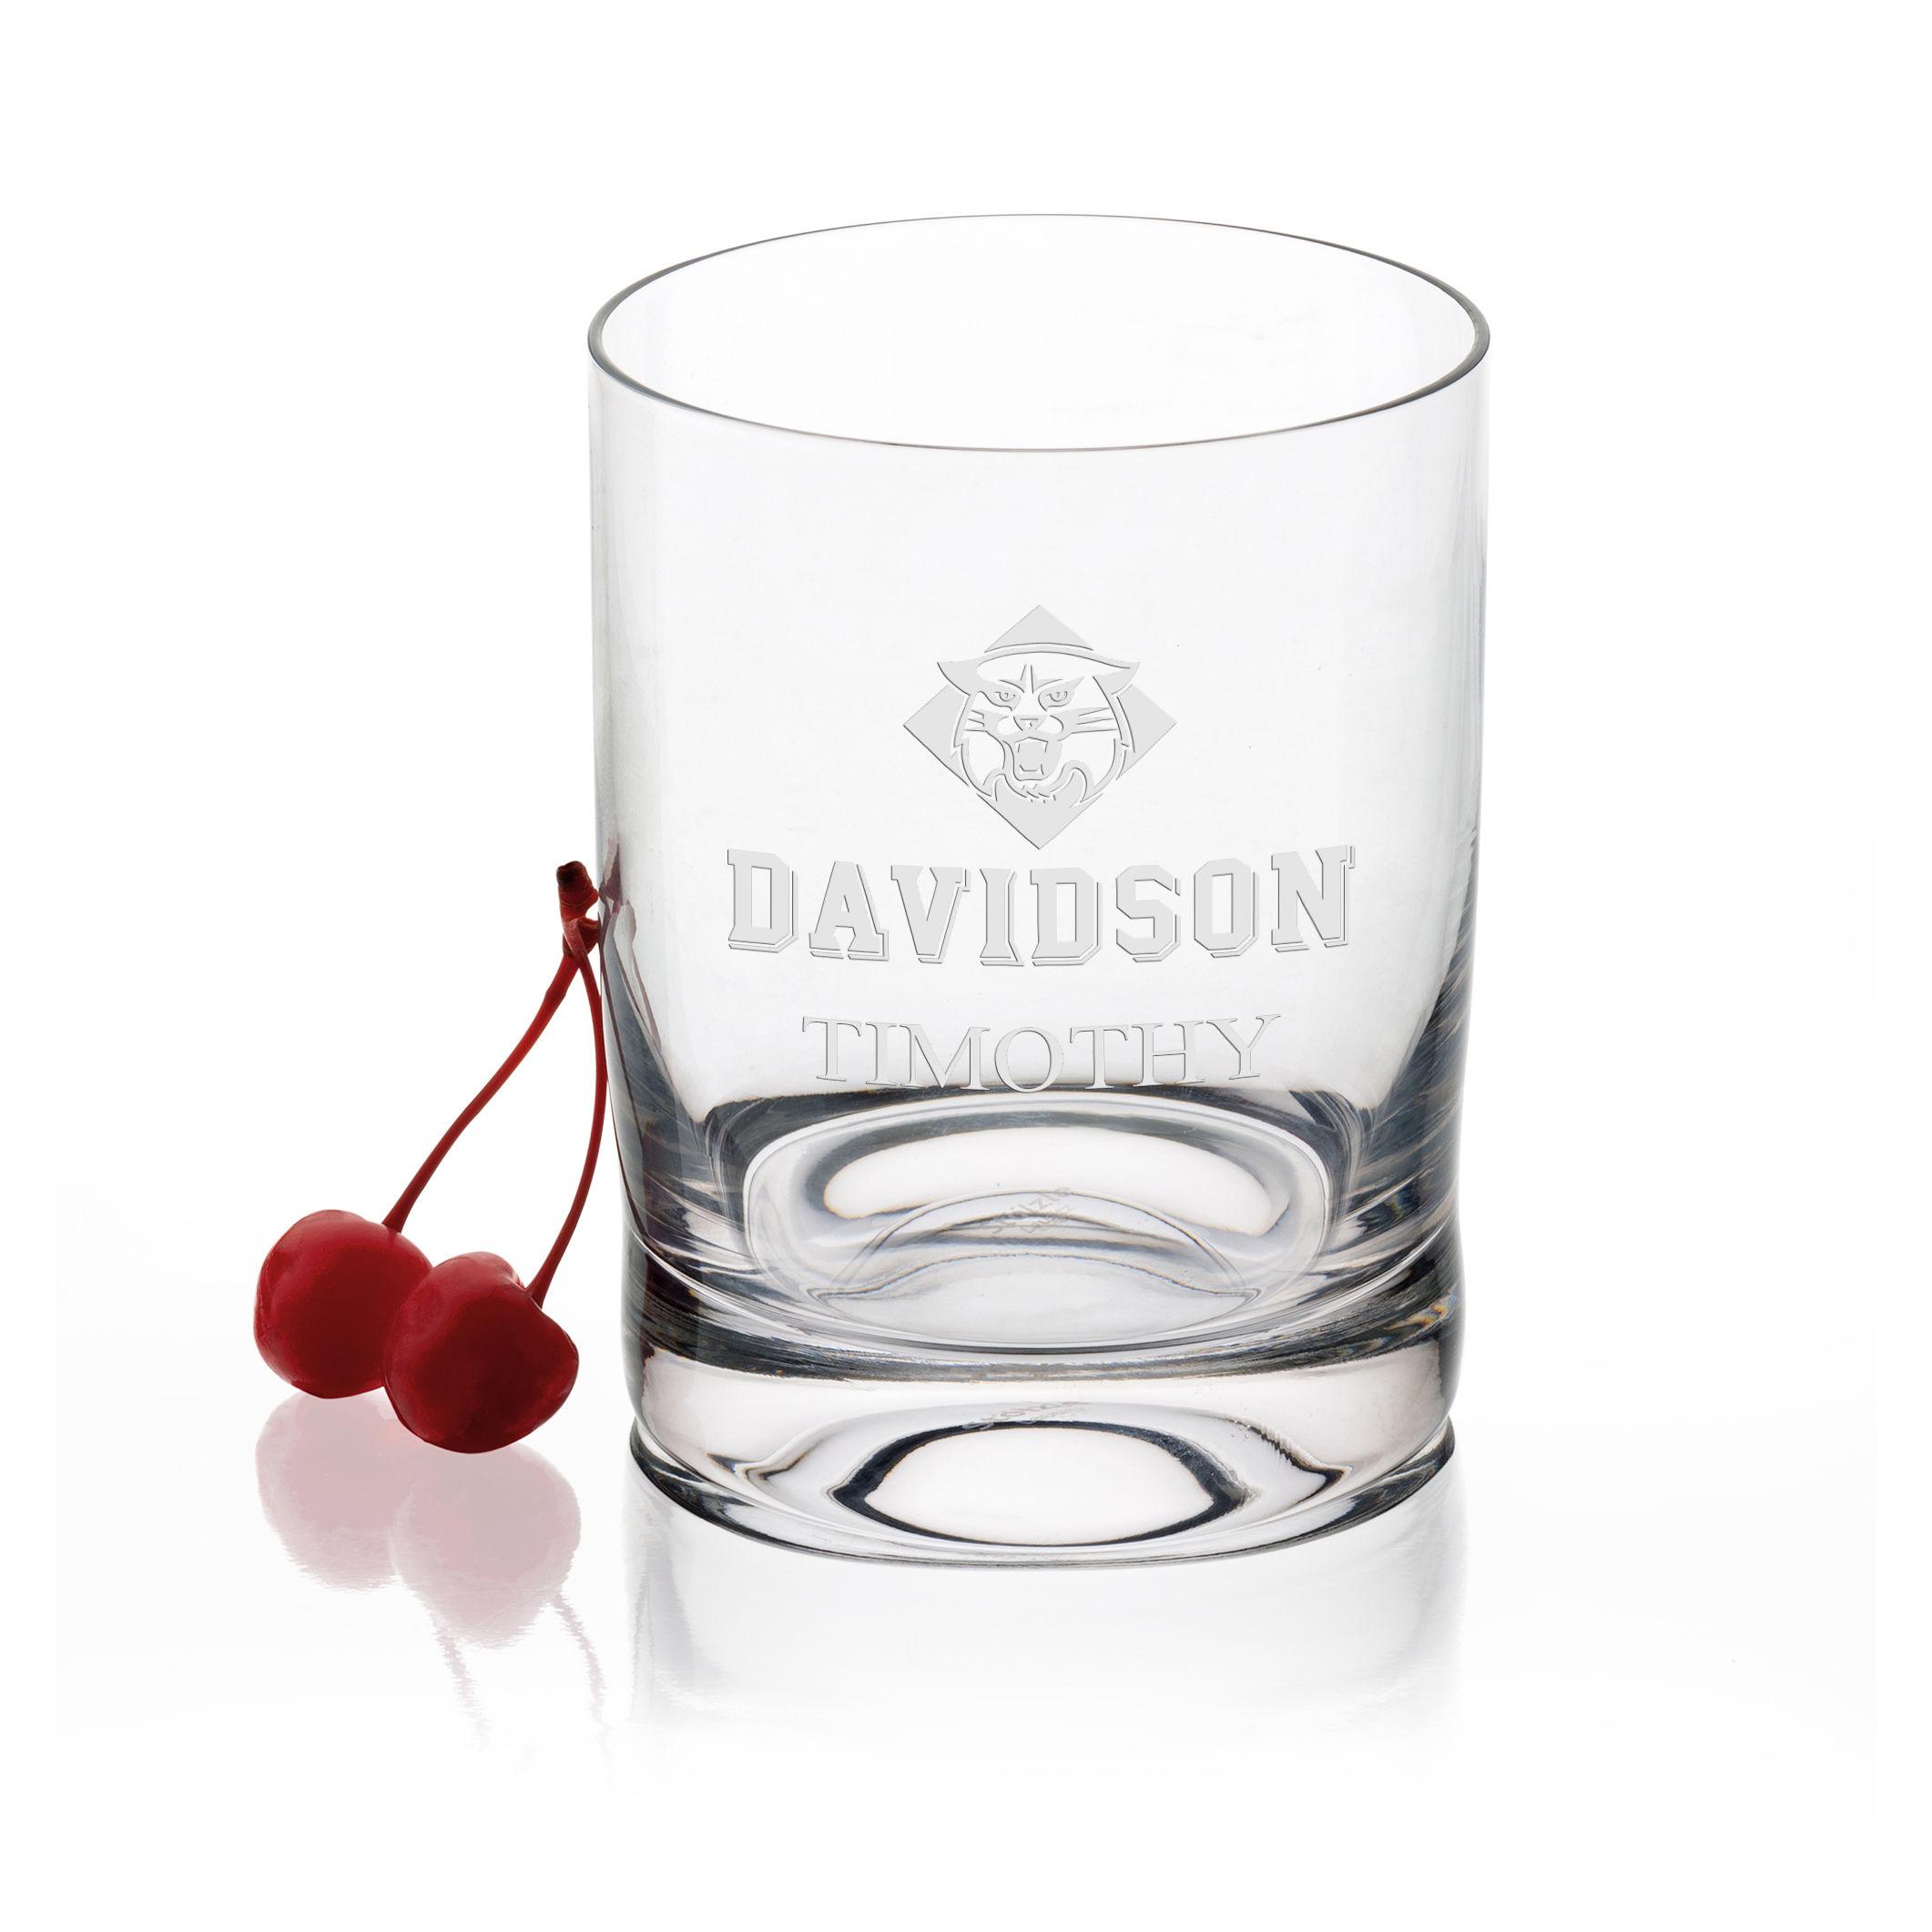 Davidson College Tumbler Glasses - Set of 2